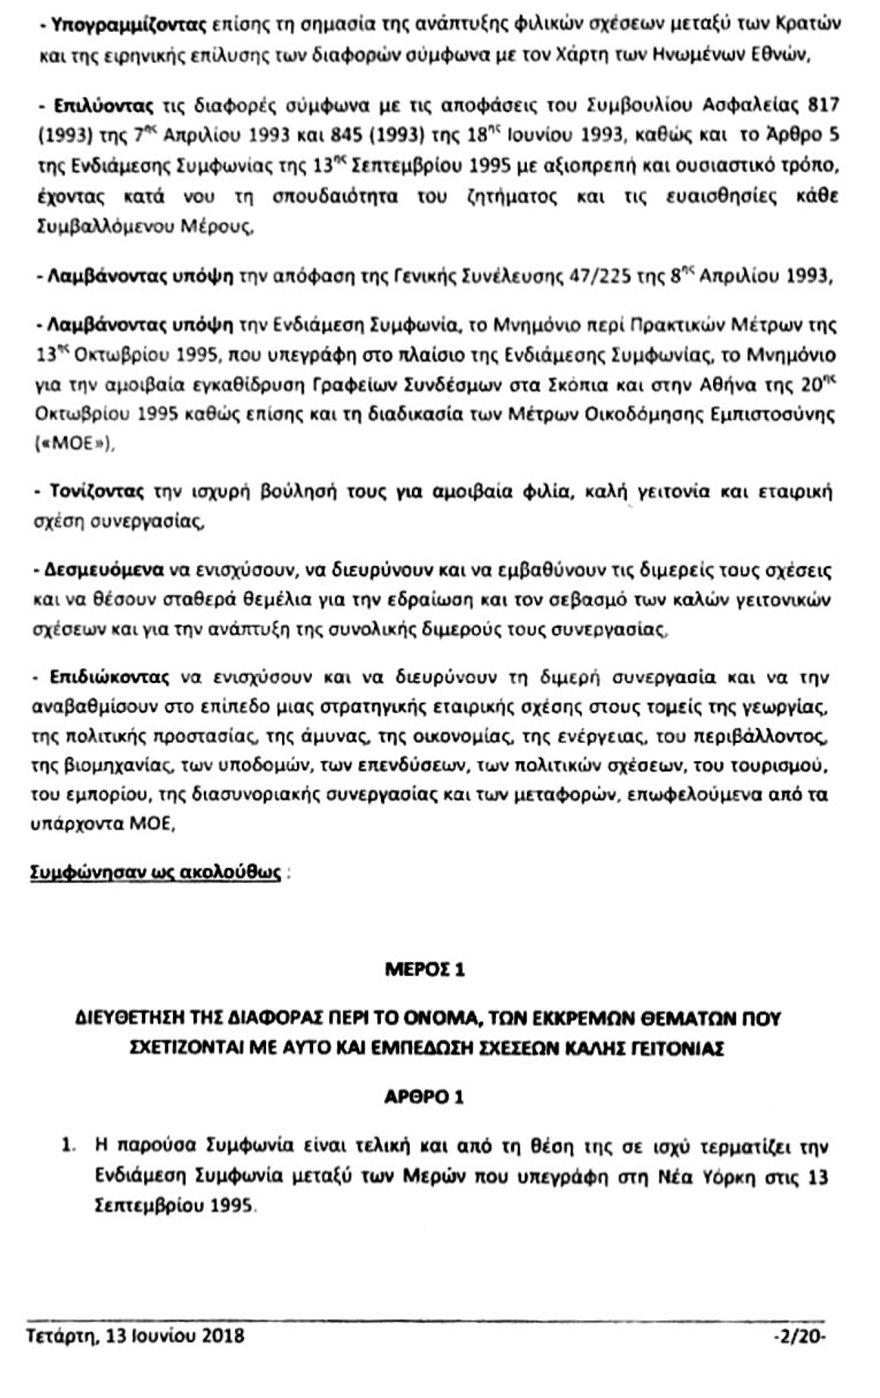 makedoniko2